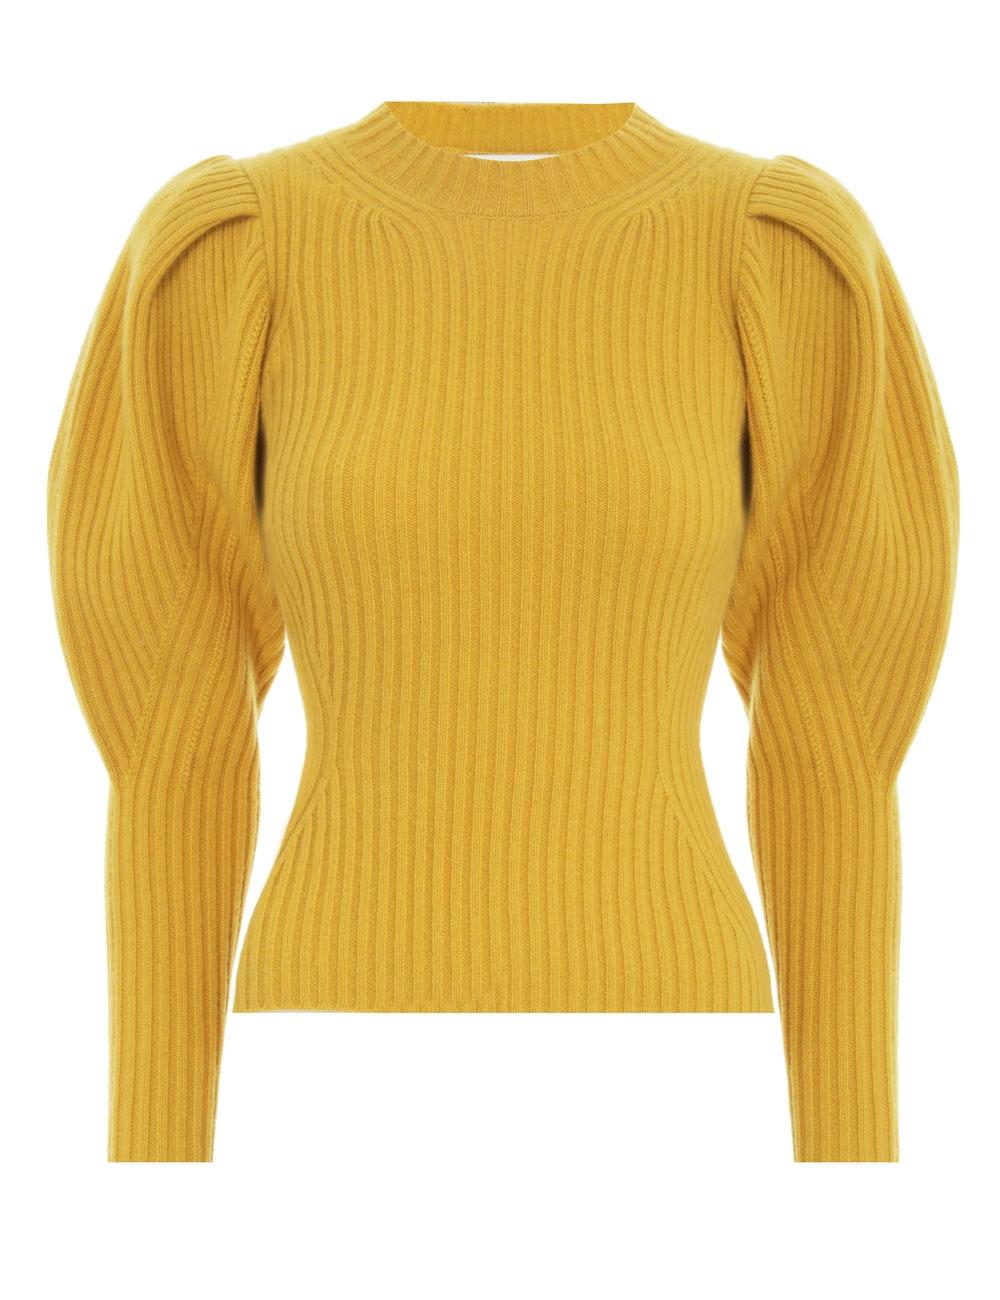 Ladybeetle Draped Sweater